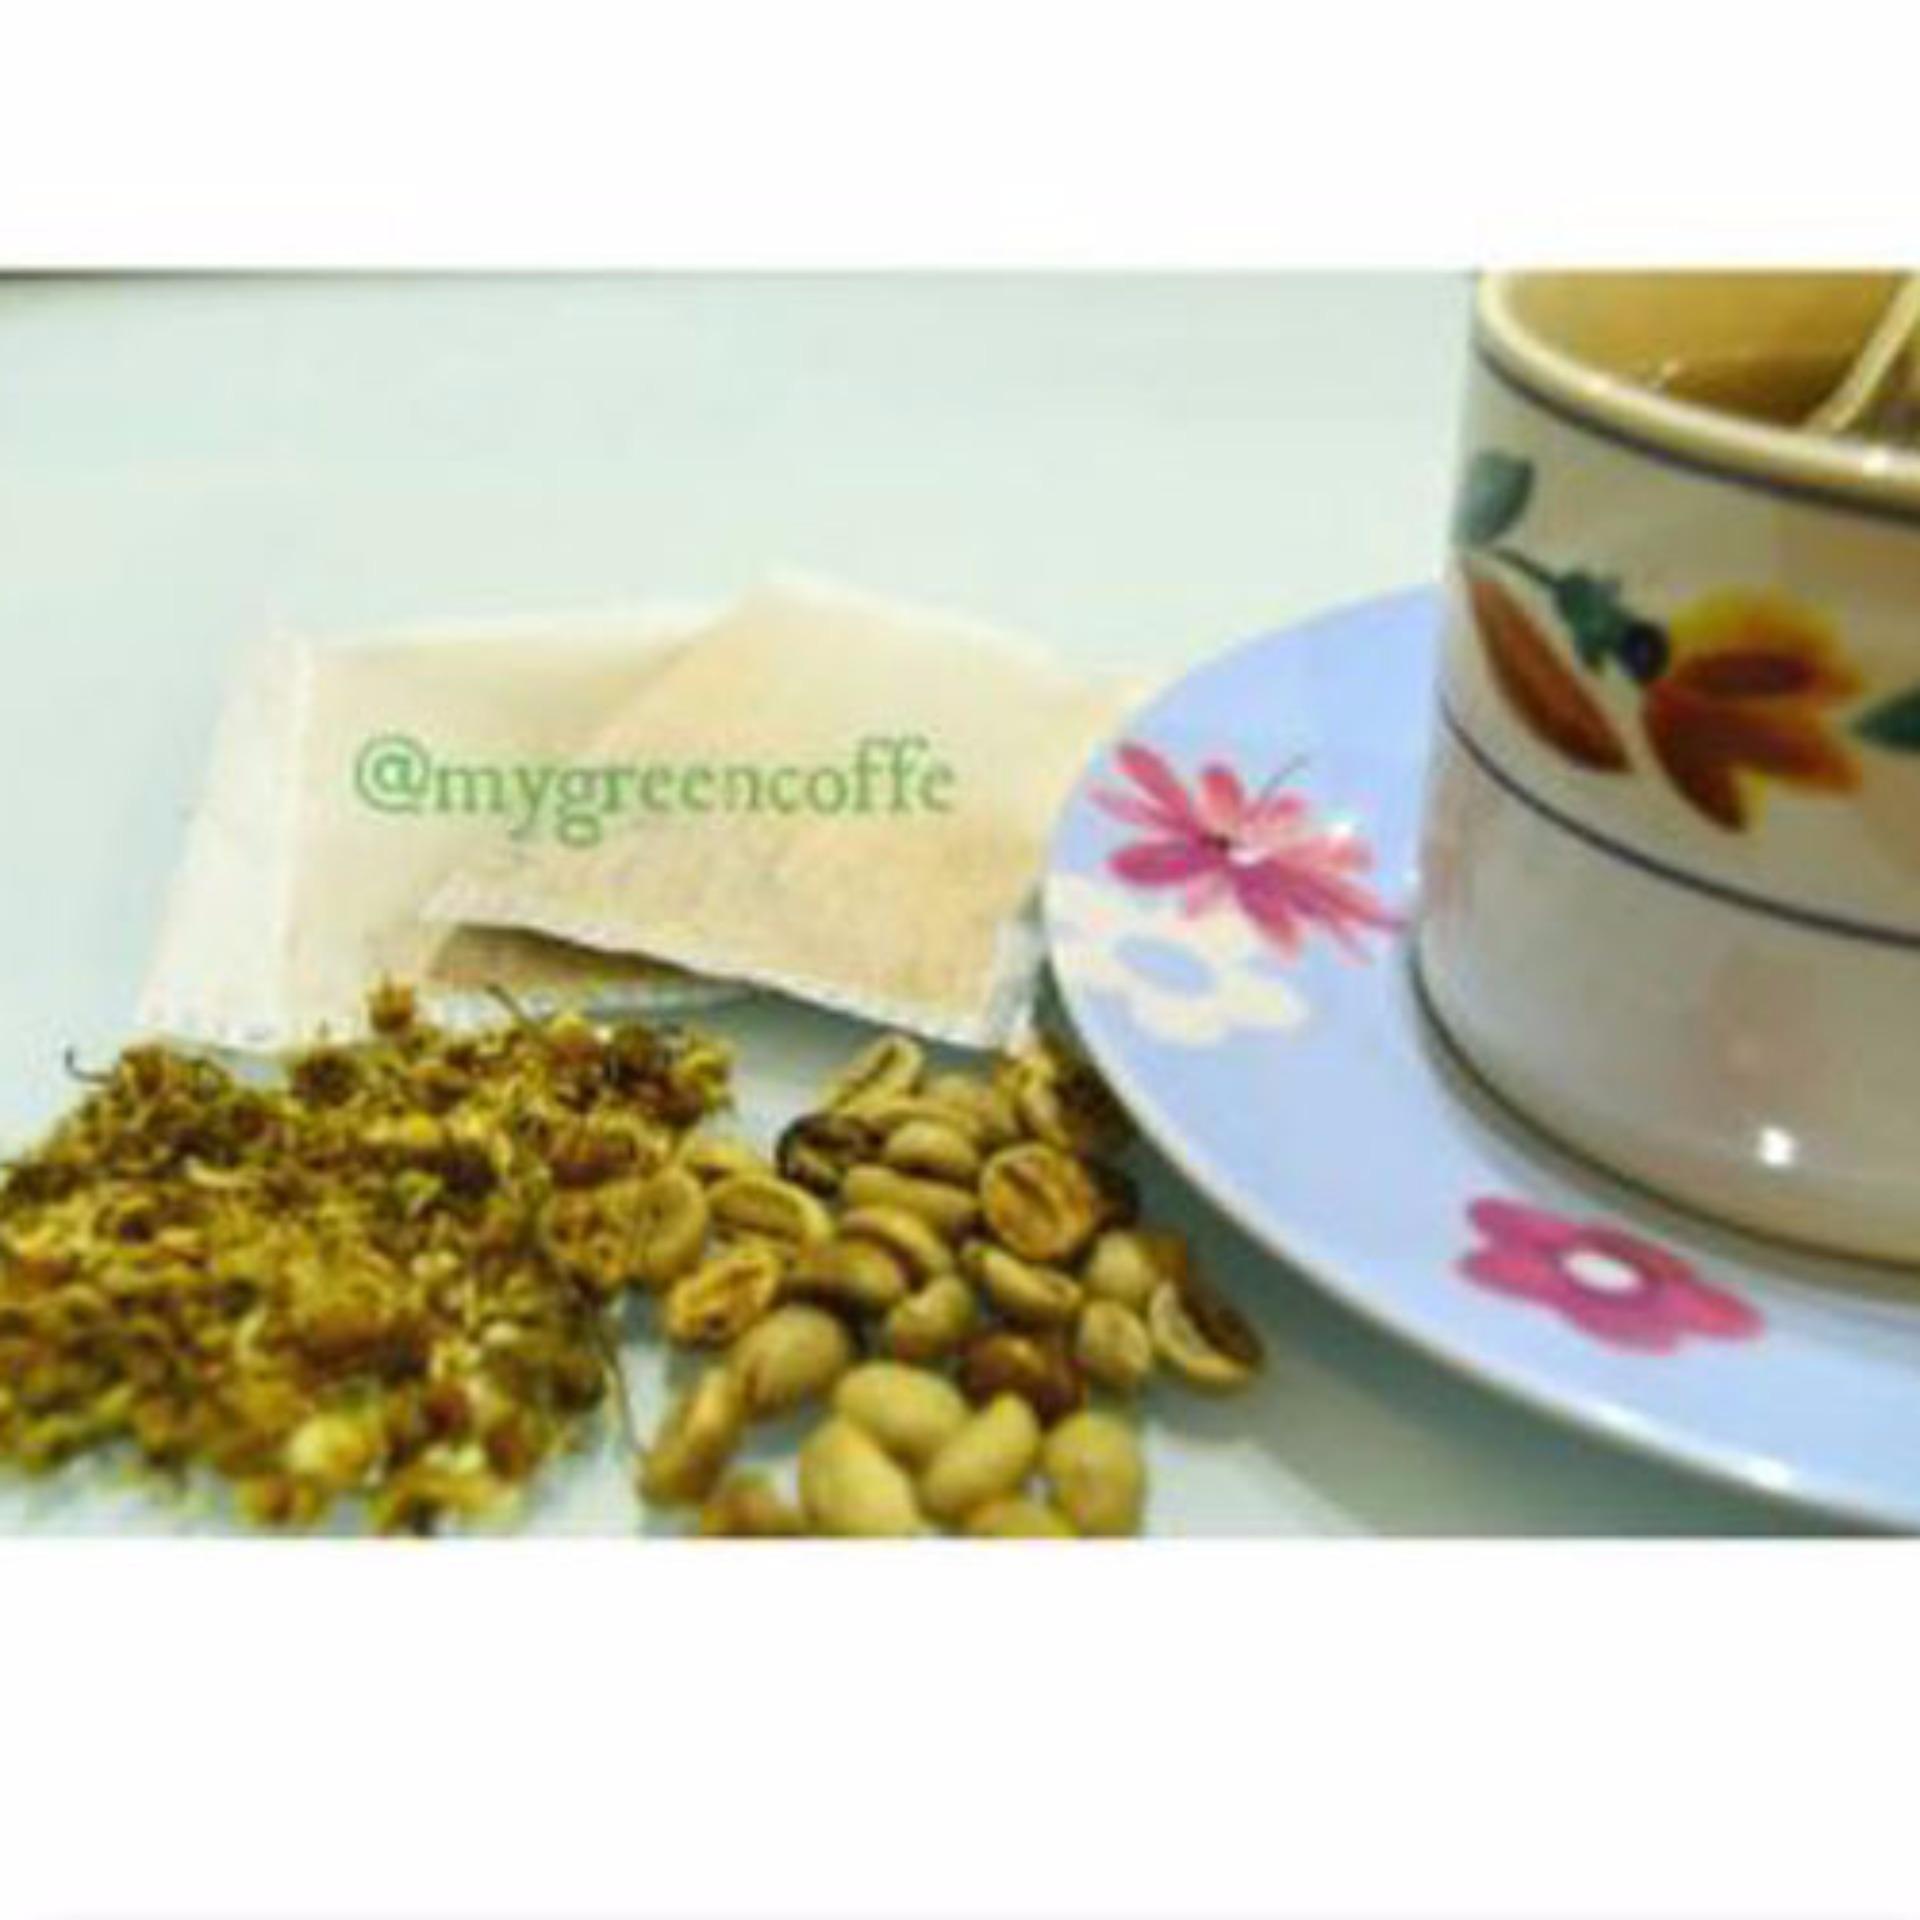 Green Coffe Powder Ovj My Coffee Bubuk Kopi Hijau Kopidiet Diet Alami Bean 200gr Dan Source Biji Berat 1kg